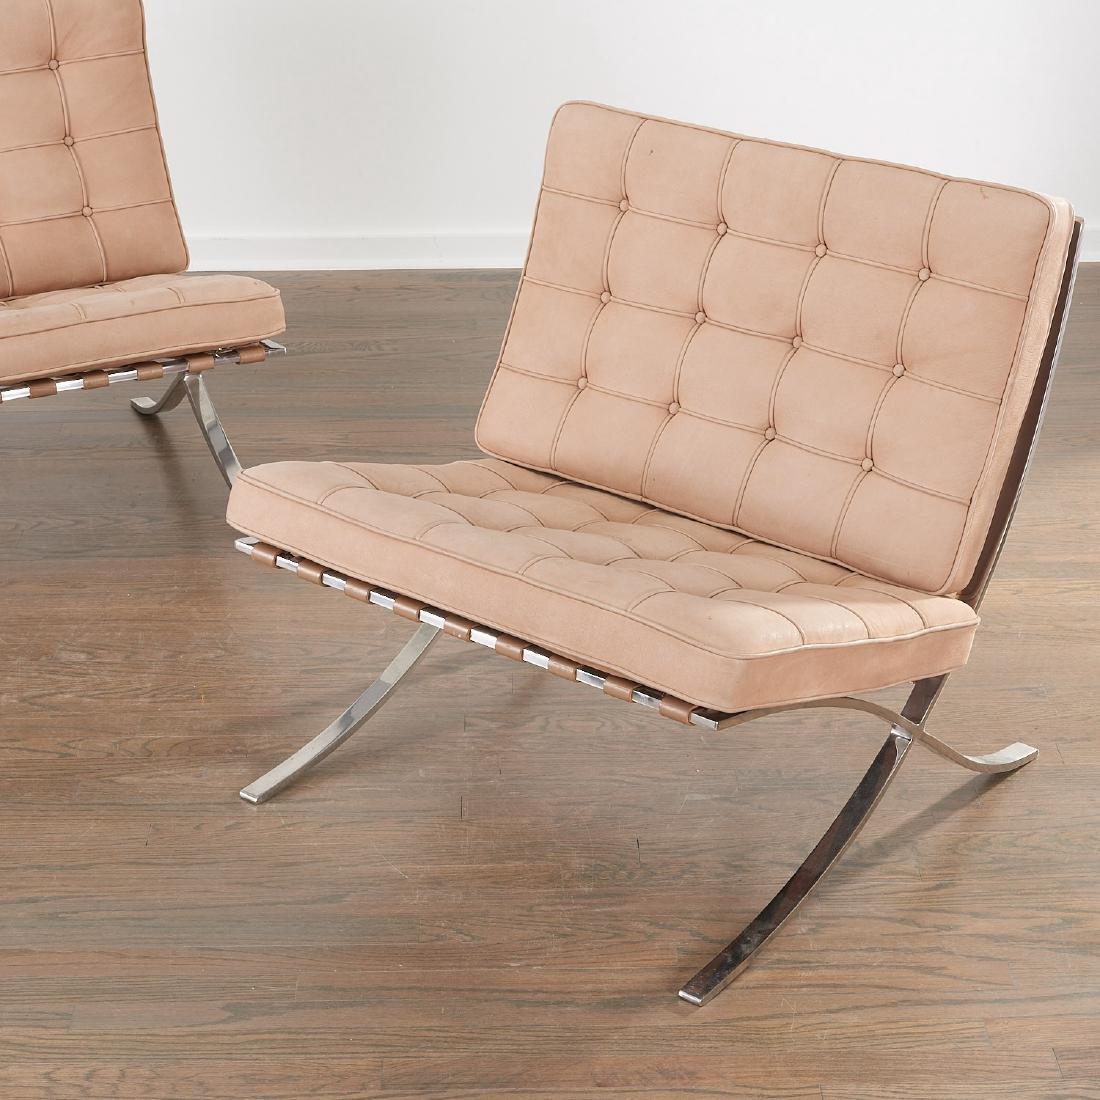 Pair Knoll Barcelona chairs